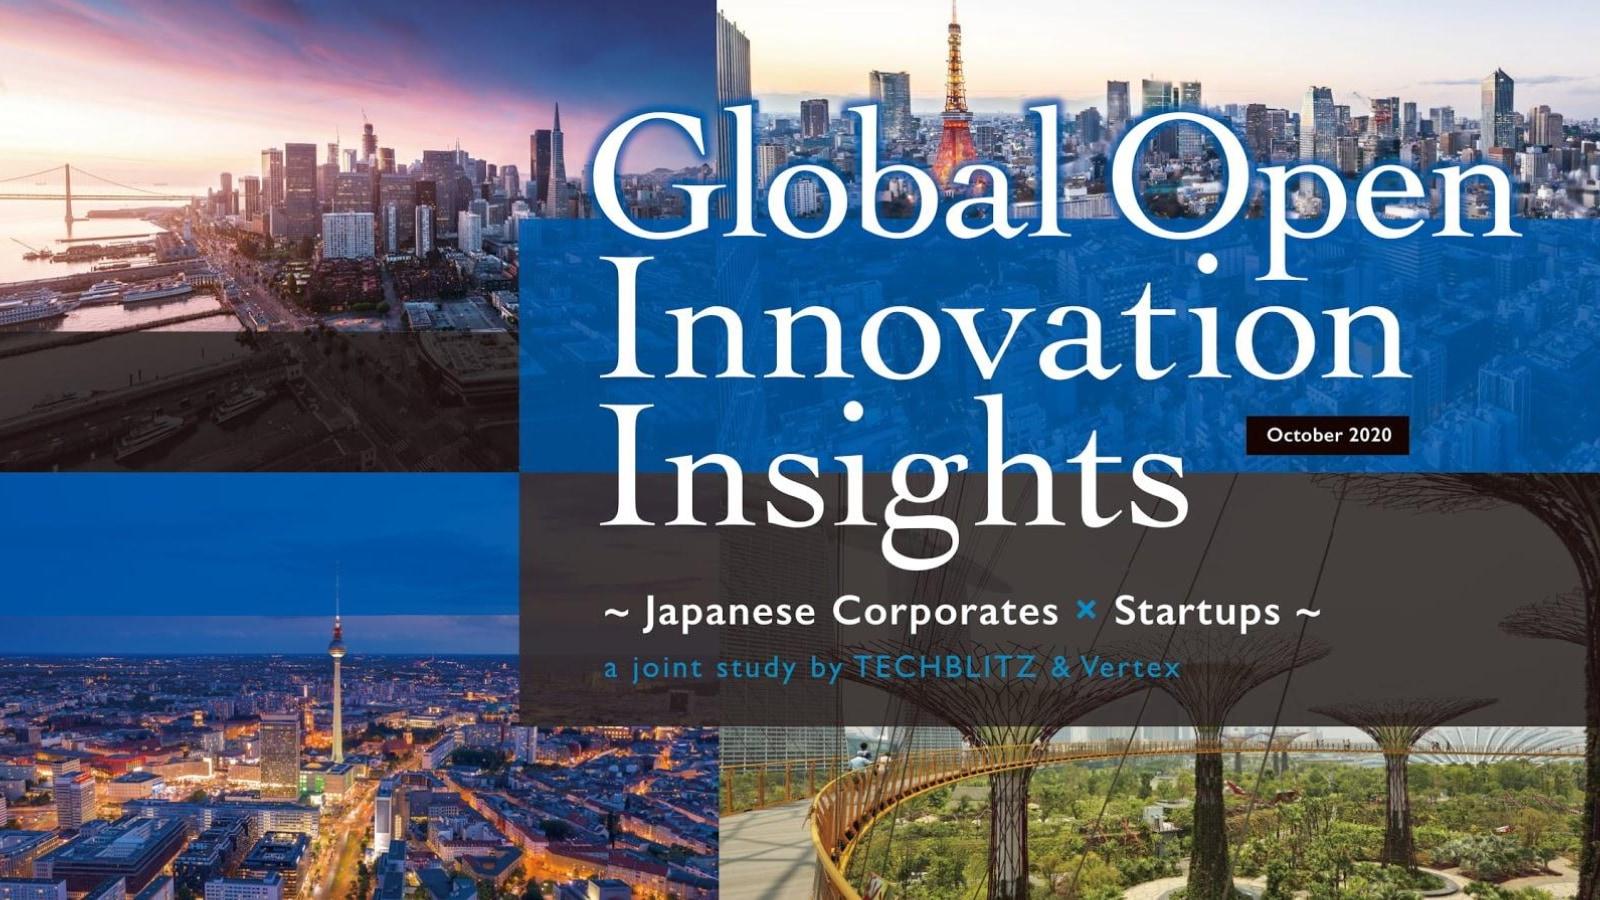 「Global Open Innovation Insights」をリリース 企業担当者の68.4%が課題感をもち、自己評価は社内体制と連動